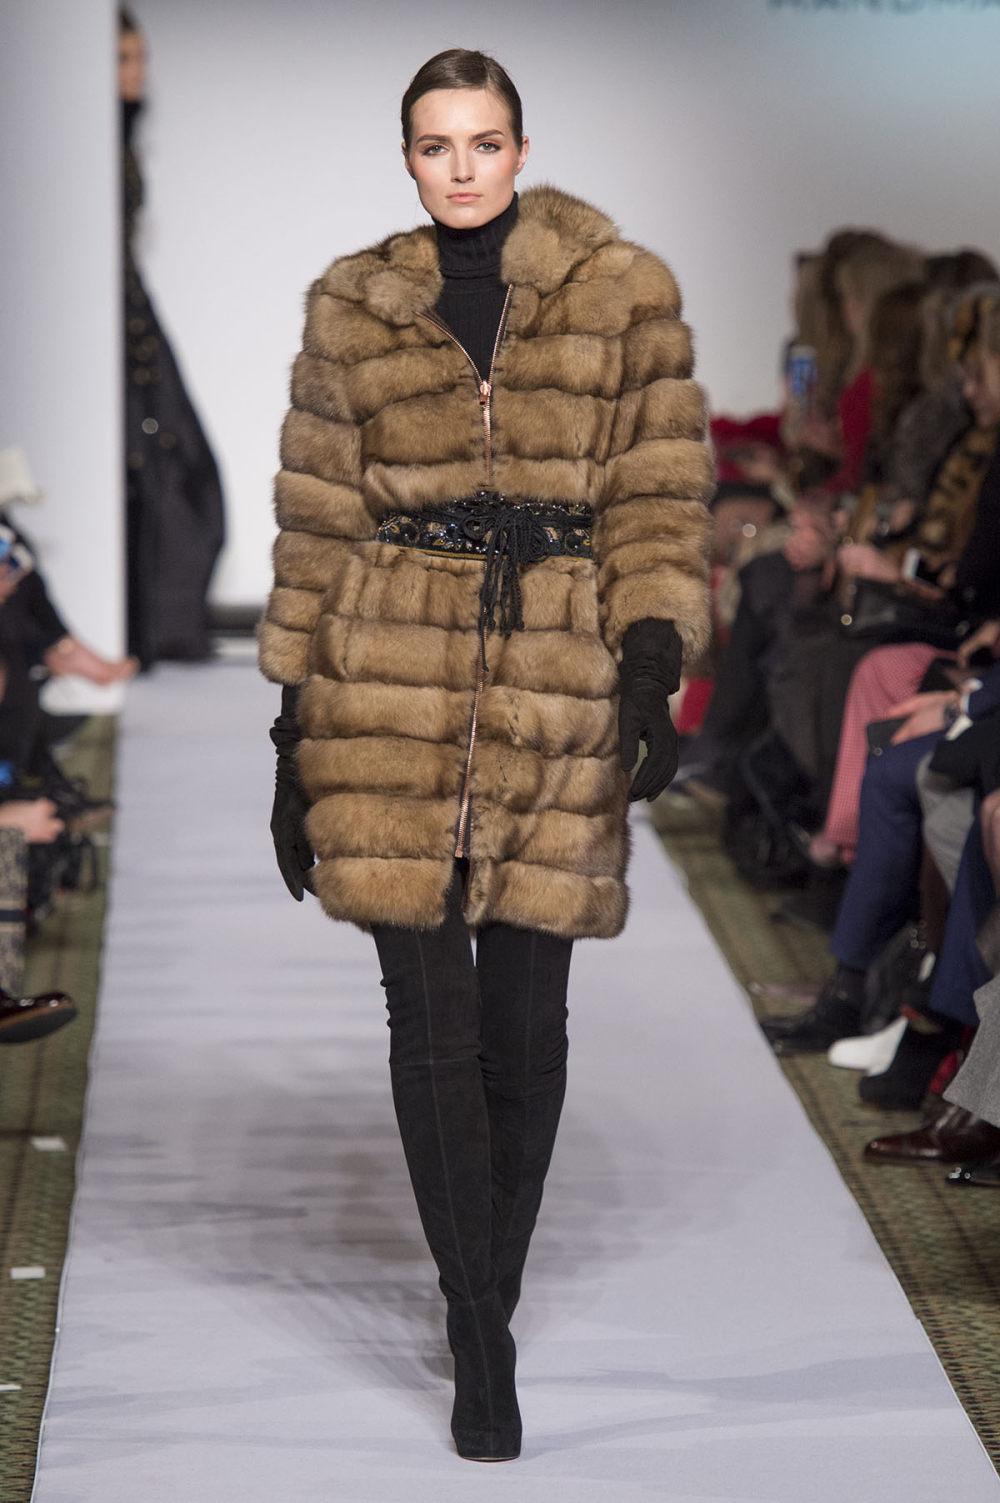 Carolina Herrera时装系列用鲜艳的颜色充满智能的黑白色调-11.jpg